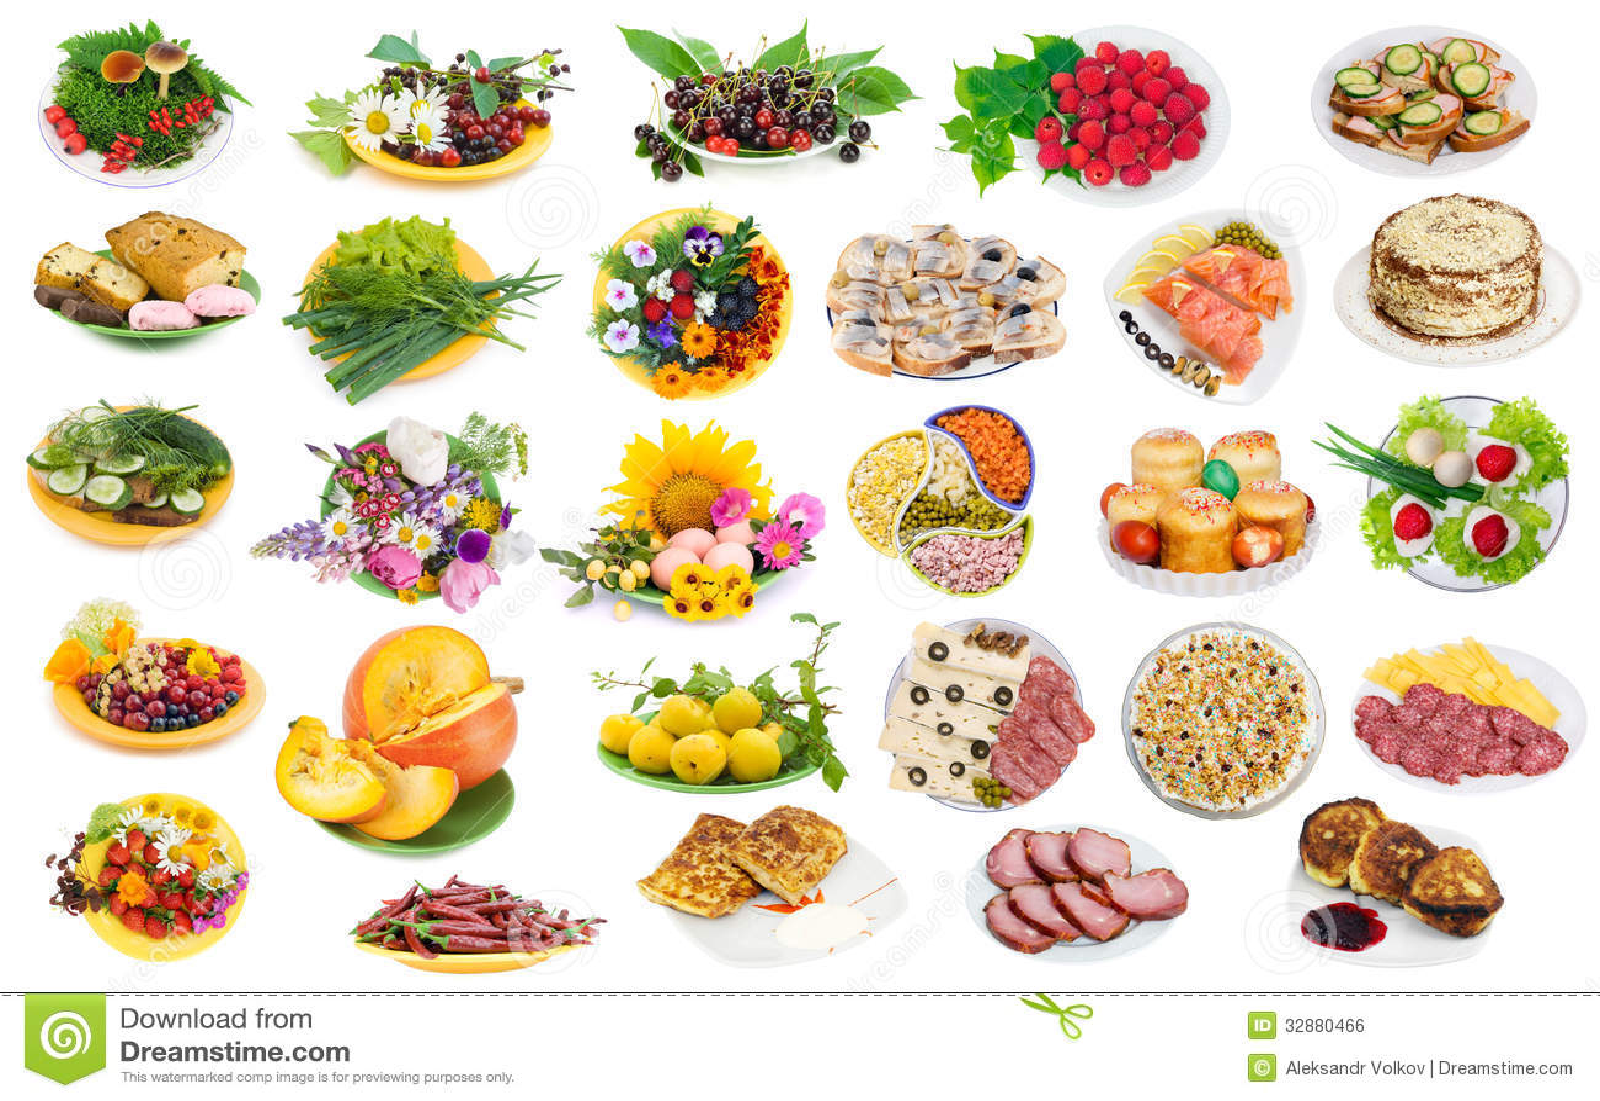 Comida en las placas fijadas